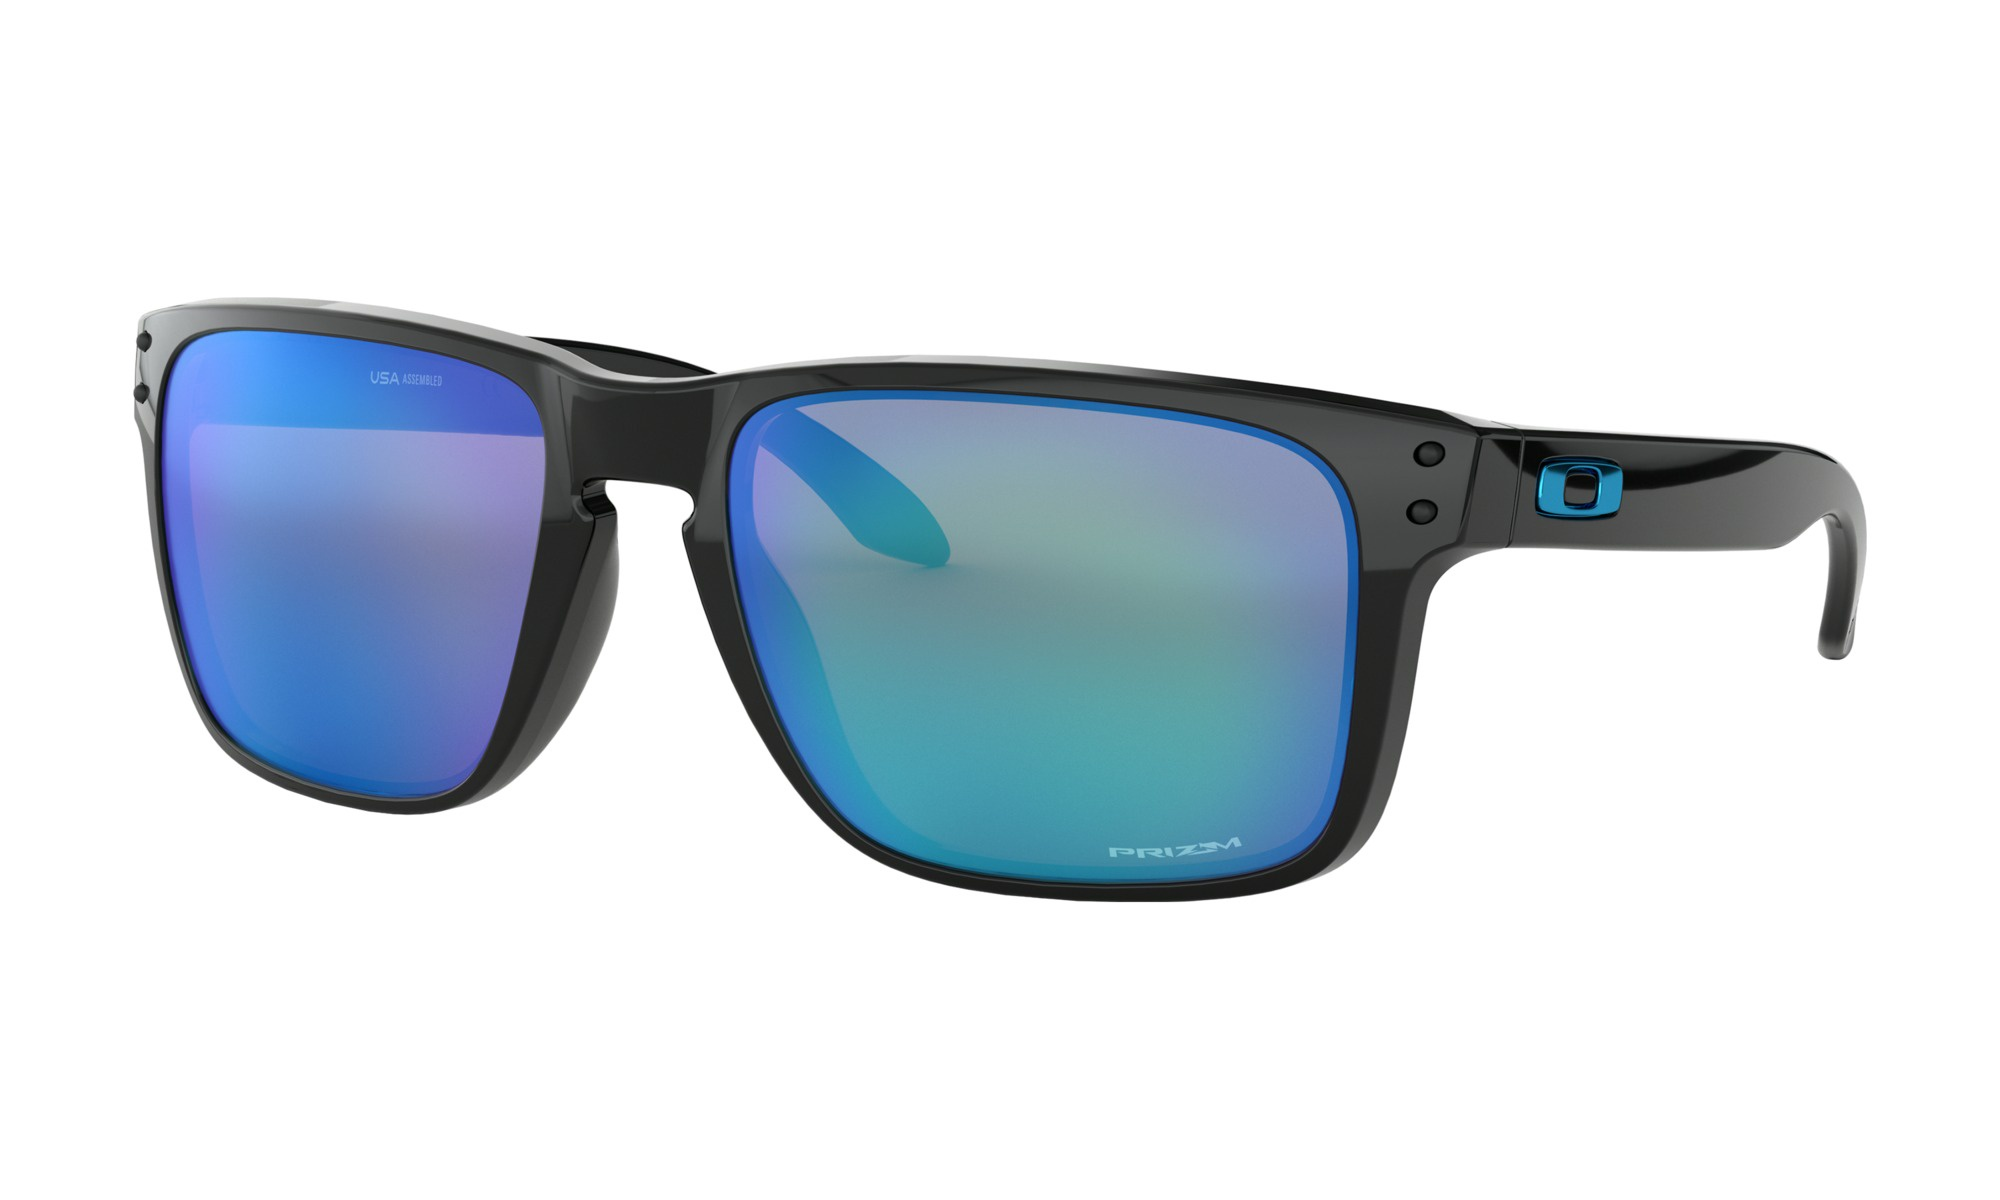 d5cf3cc855 Oakley Holbrook XL - Polished Black w Prizm Sapphire Iridium - Out There  Surf